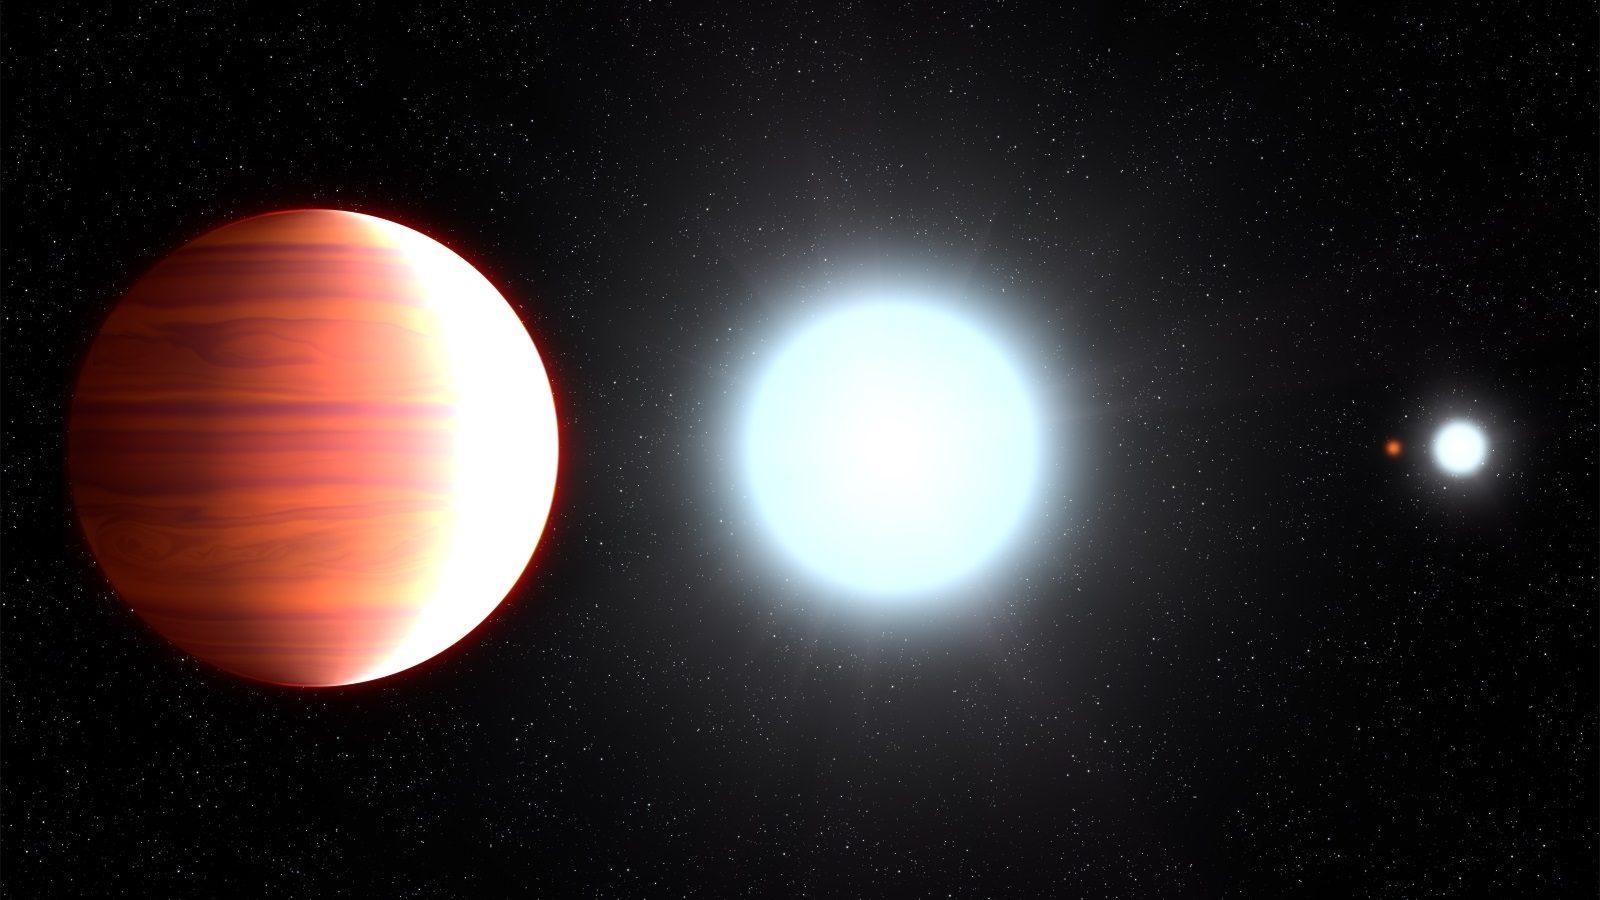 Kepler-13Ab / Kepler-13 stellar system (A, B, and C)